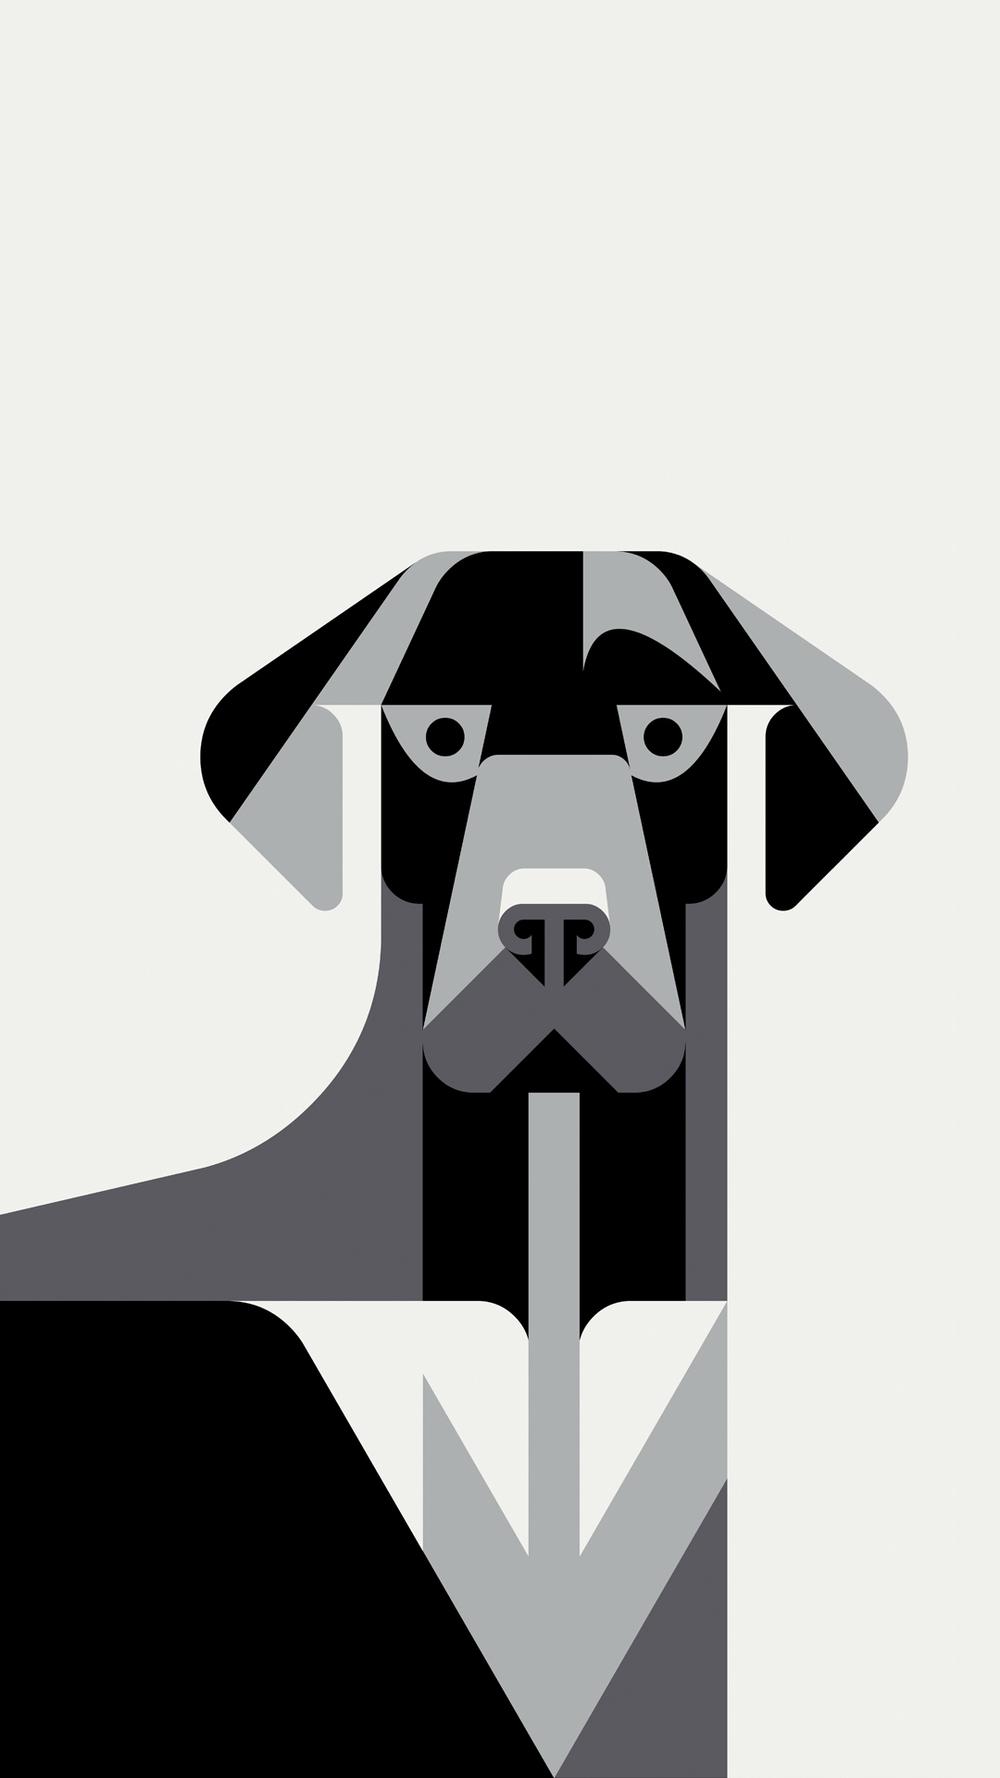 LabradorPortrait_Wallpaper_JoshBrill.jpg